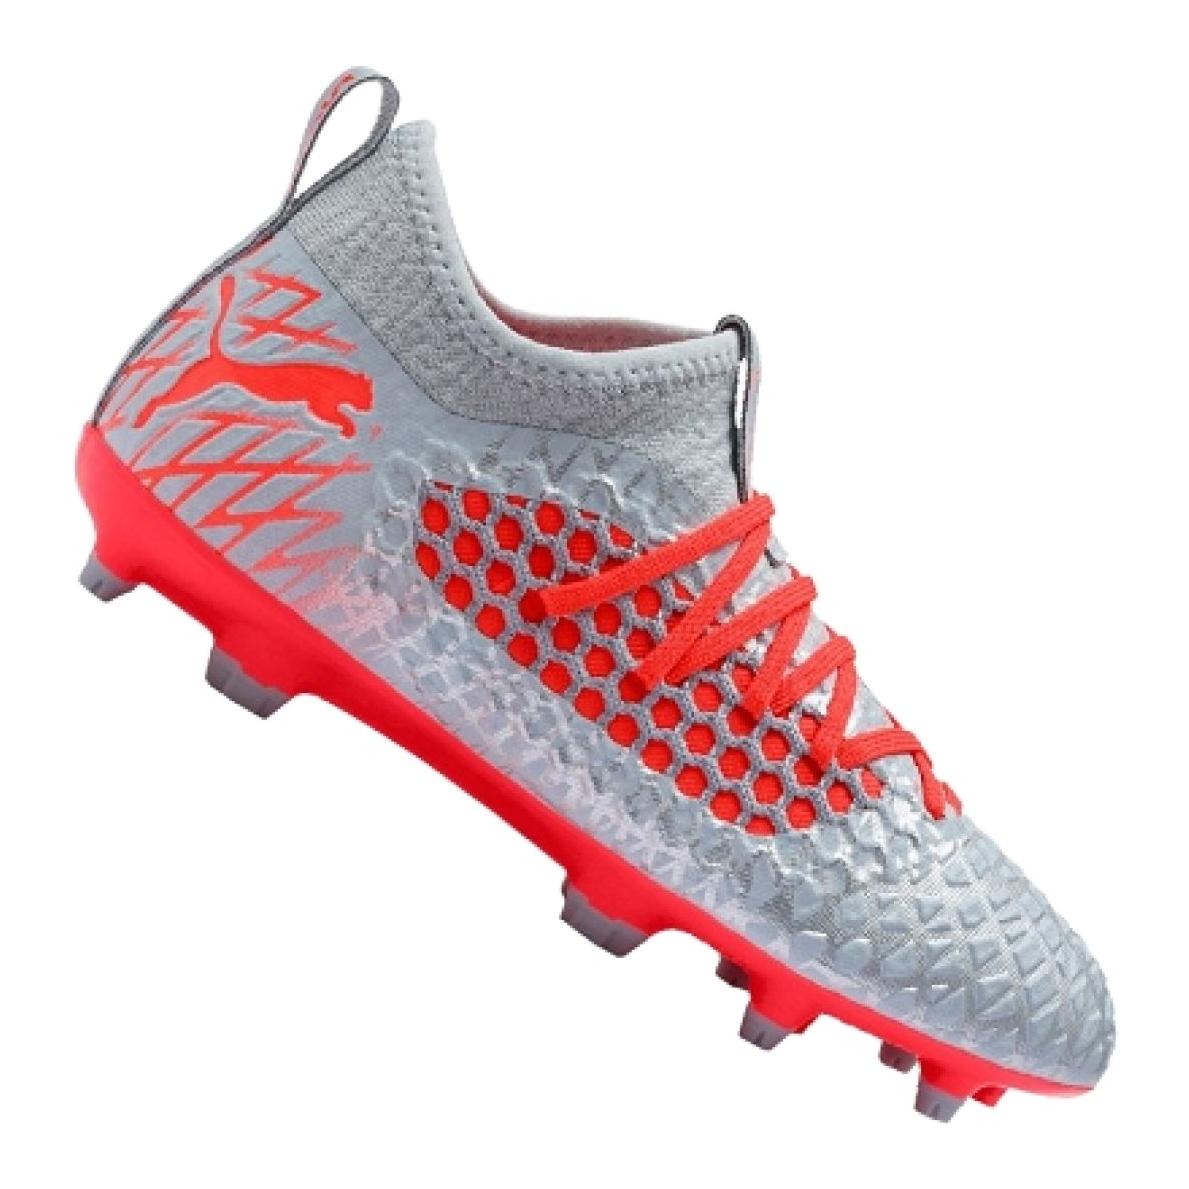 Details Zu Fussballschuhe Puma Future 4 3 Netfit Fg Ag Jr 105693 01